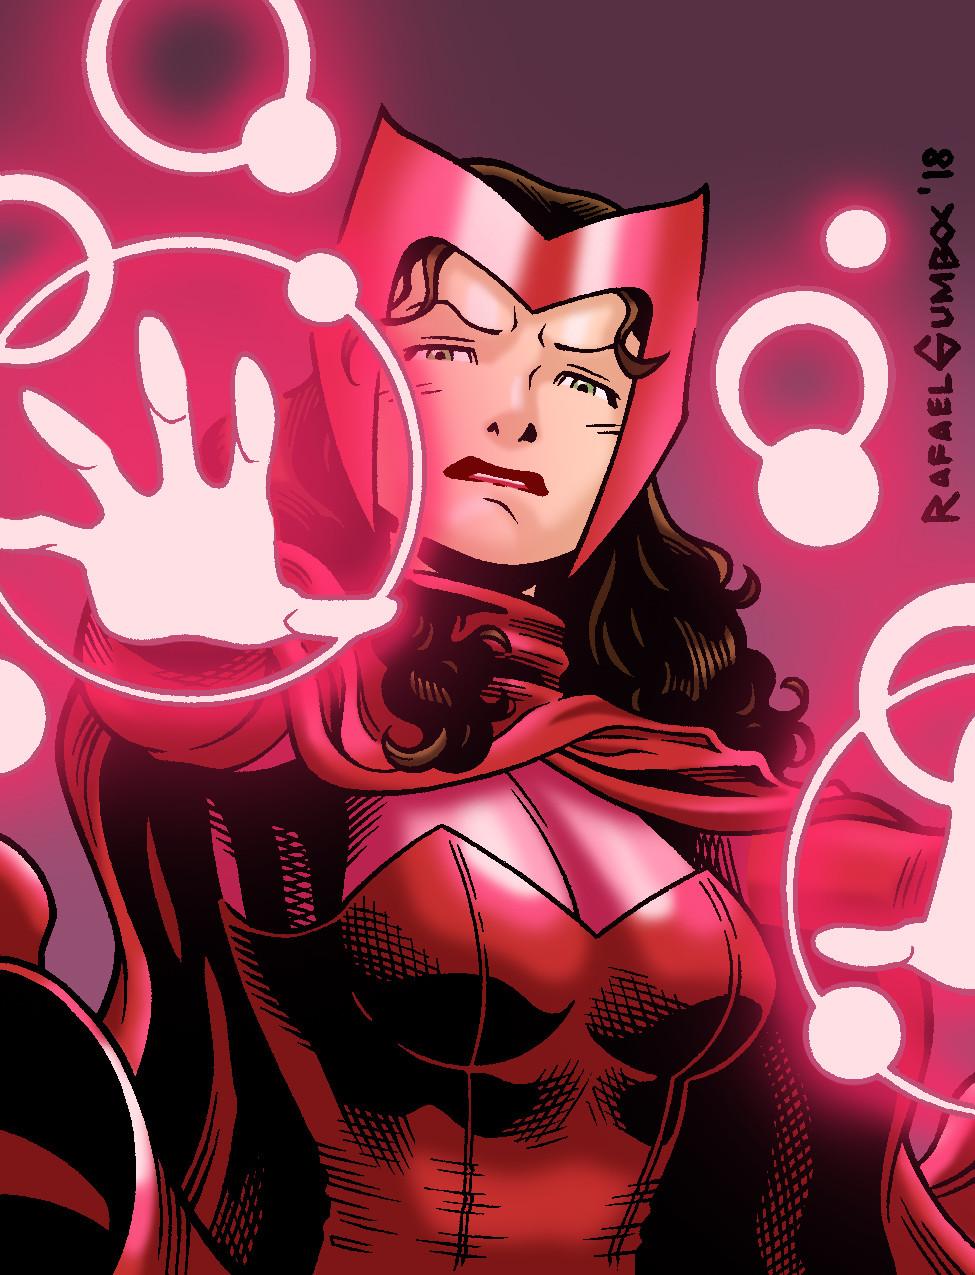 Artstation Scarlet Witch Practice Digital Colors Rafael Gumboc In 2020 Scarlet Witch Comic Scarlet Witch Avengers Drawings